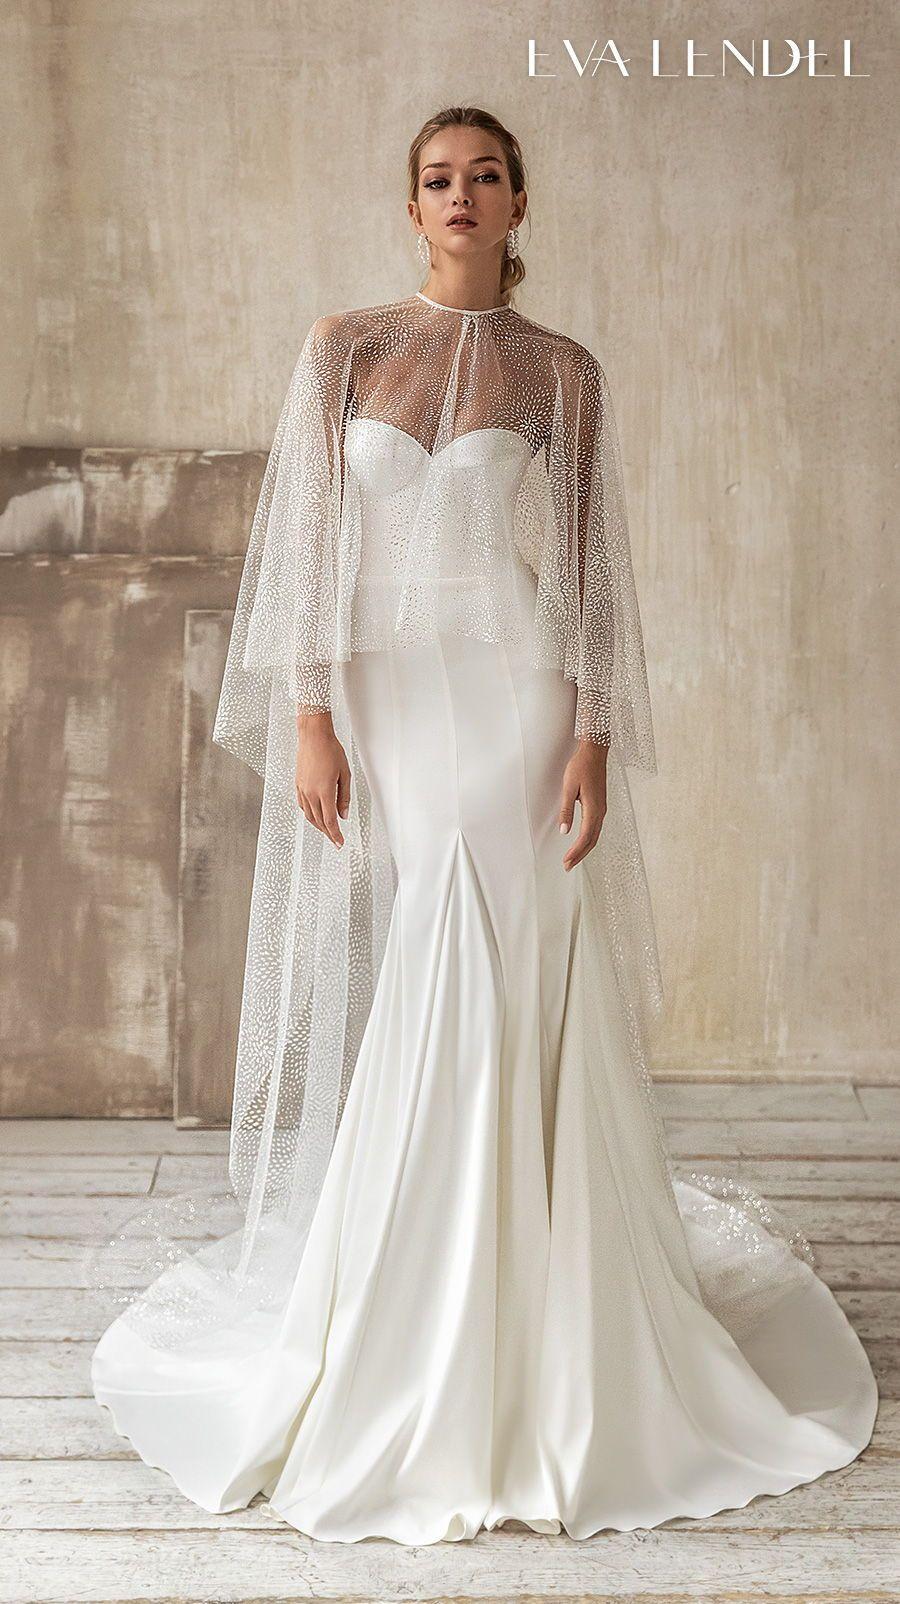 19 dress Wedding casamento ideas